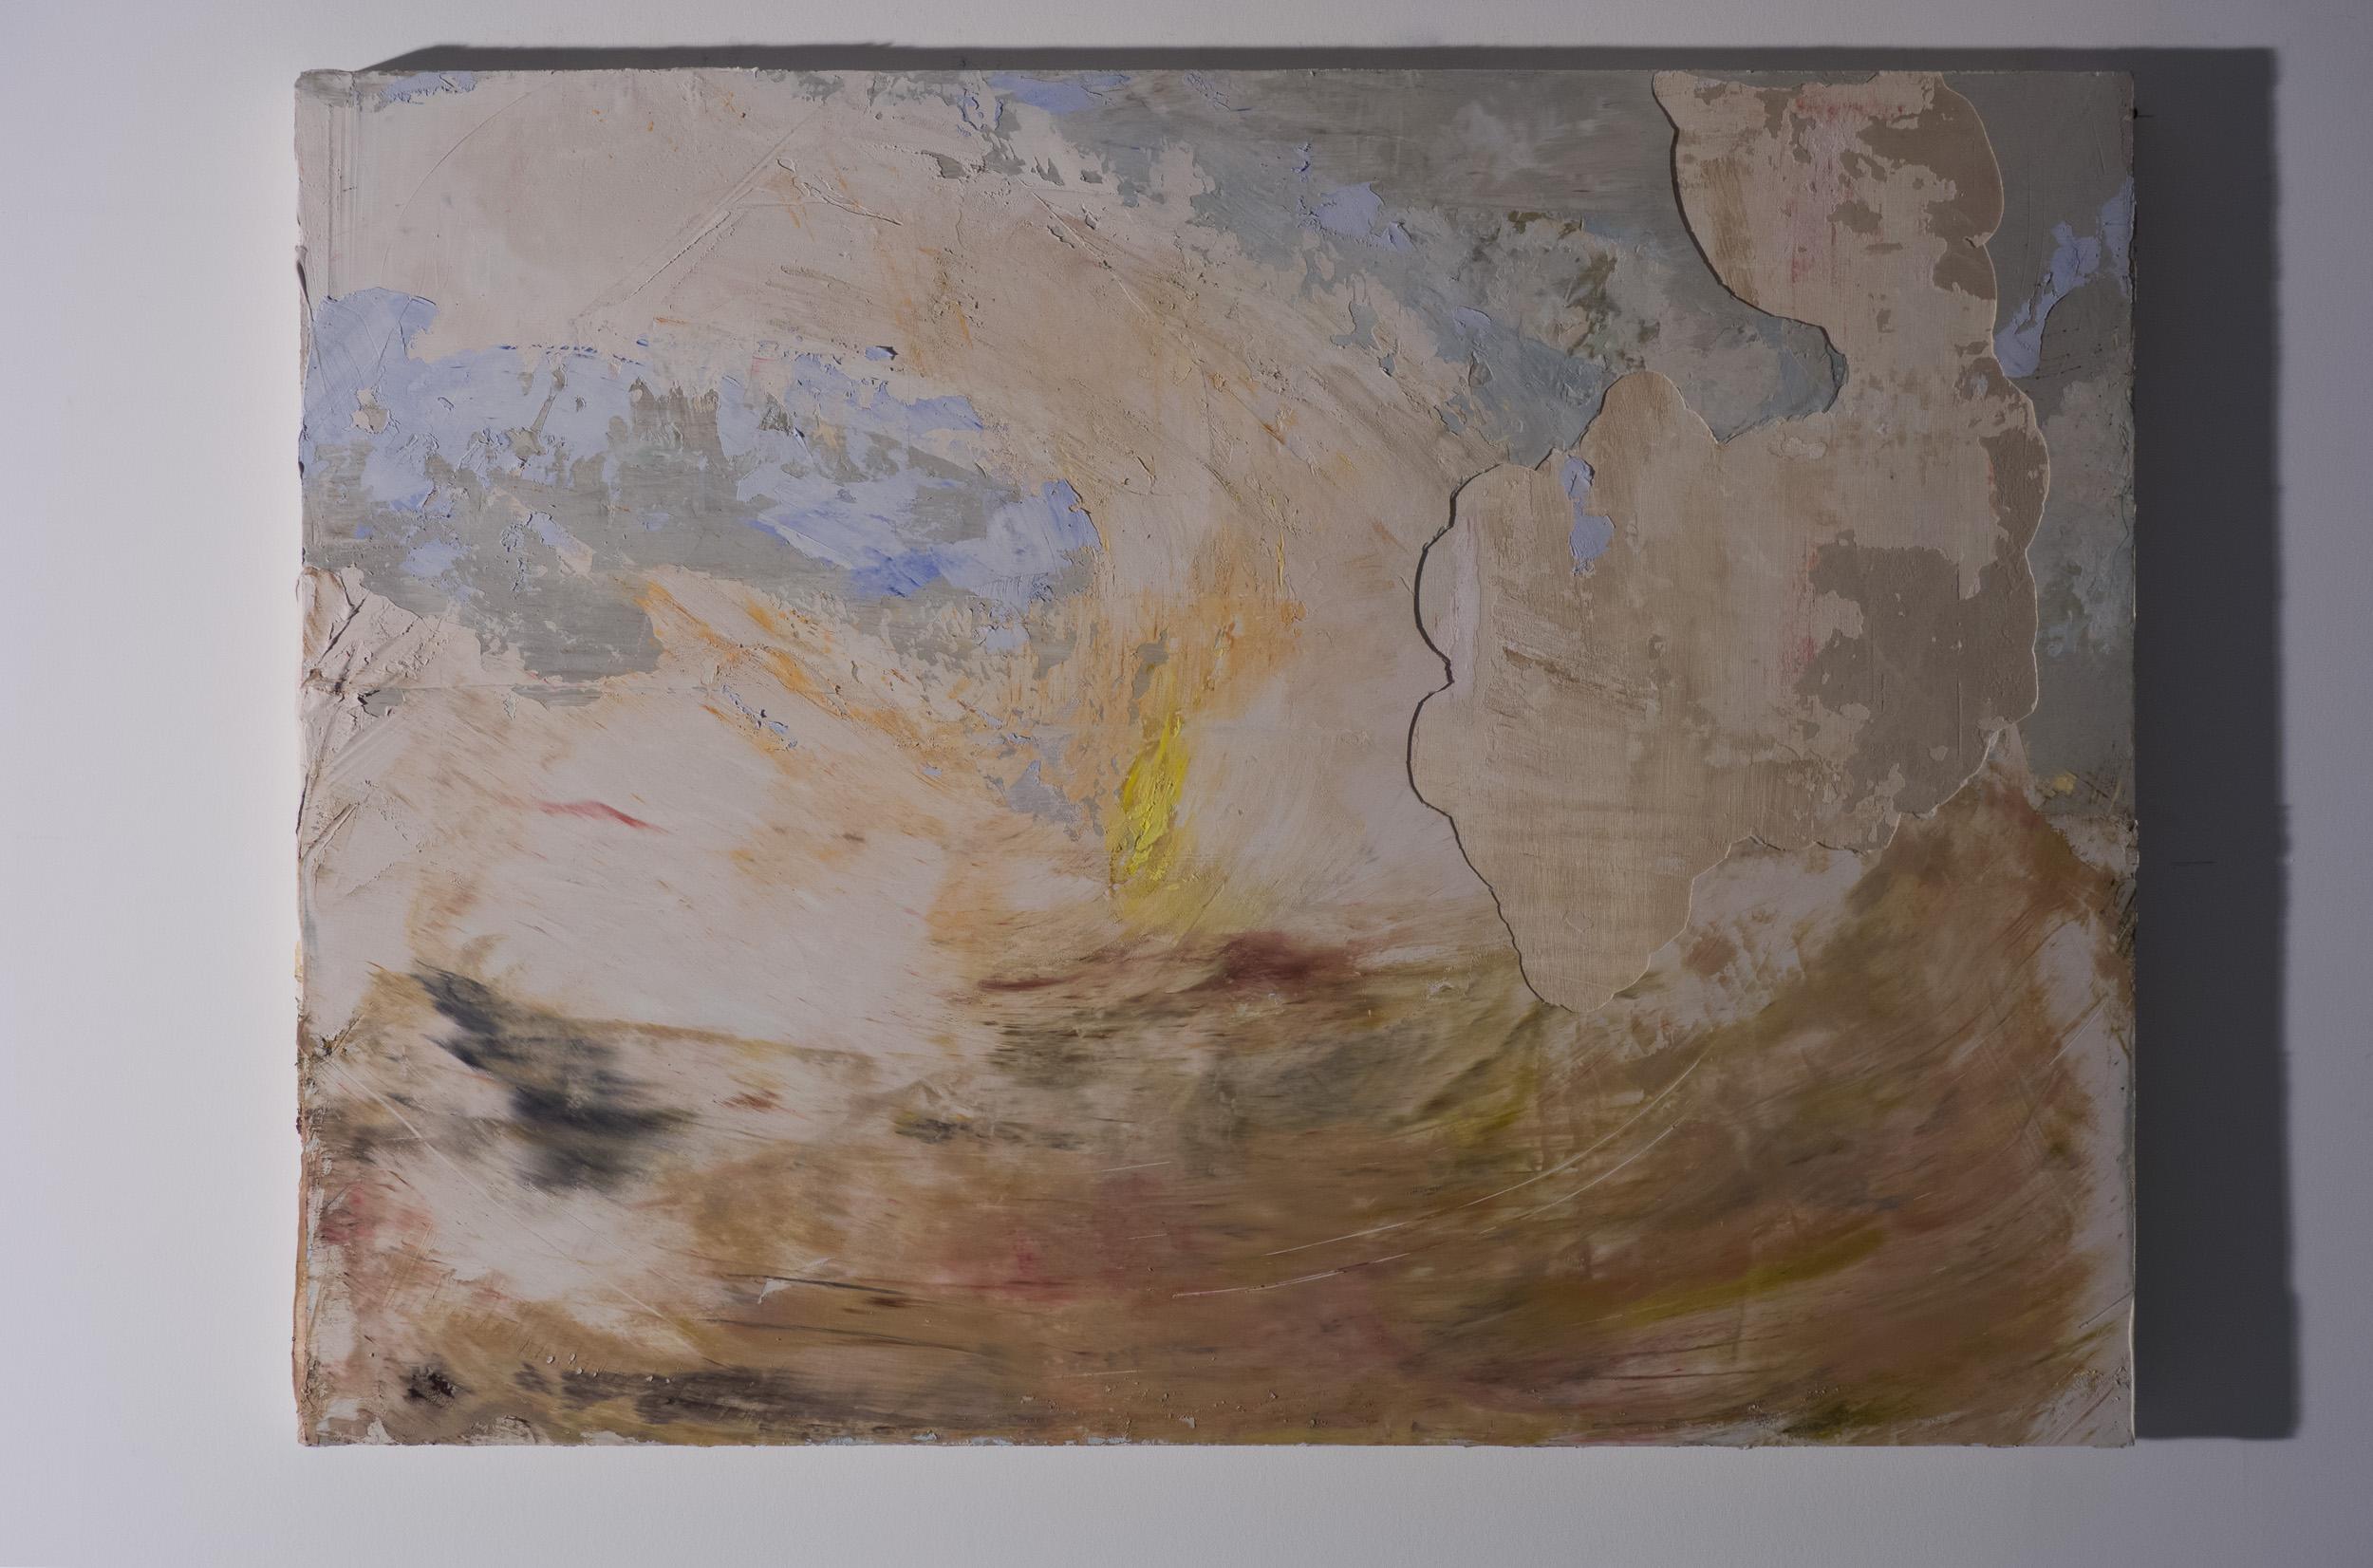 Shelley Vanderbyl - Signal Fire (Day) (Side Light) - 2016 - Fresco on Panel - 30x40.jpg